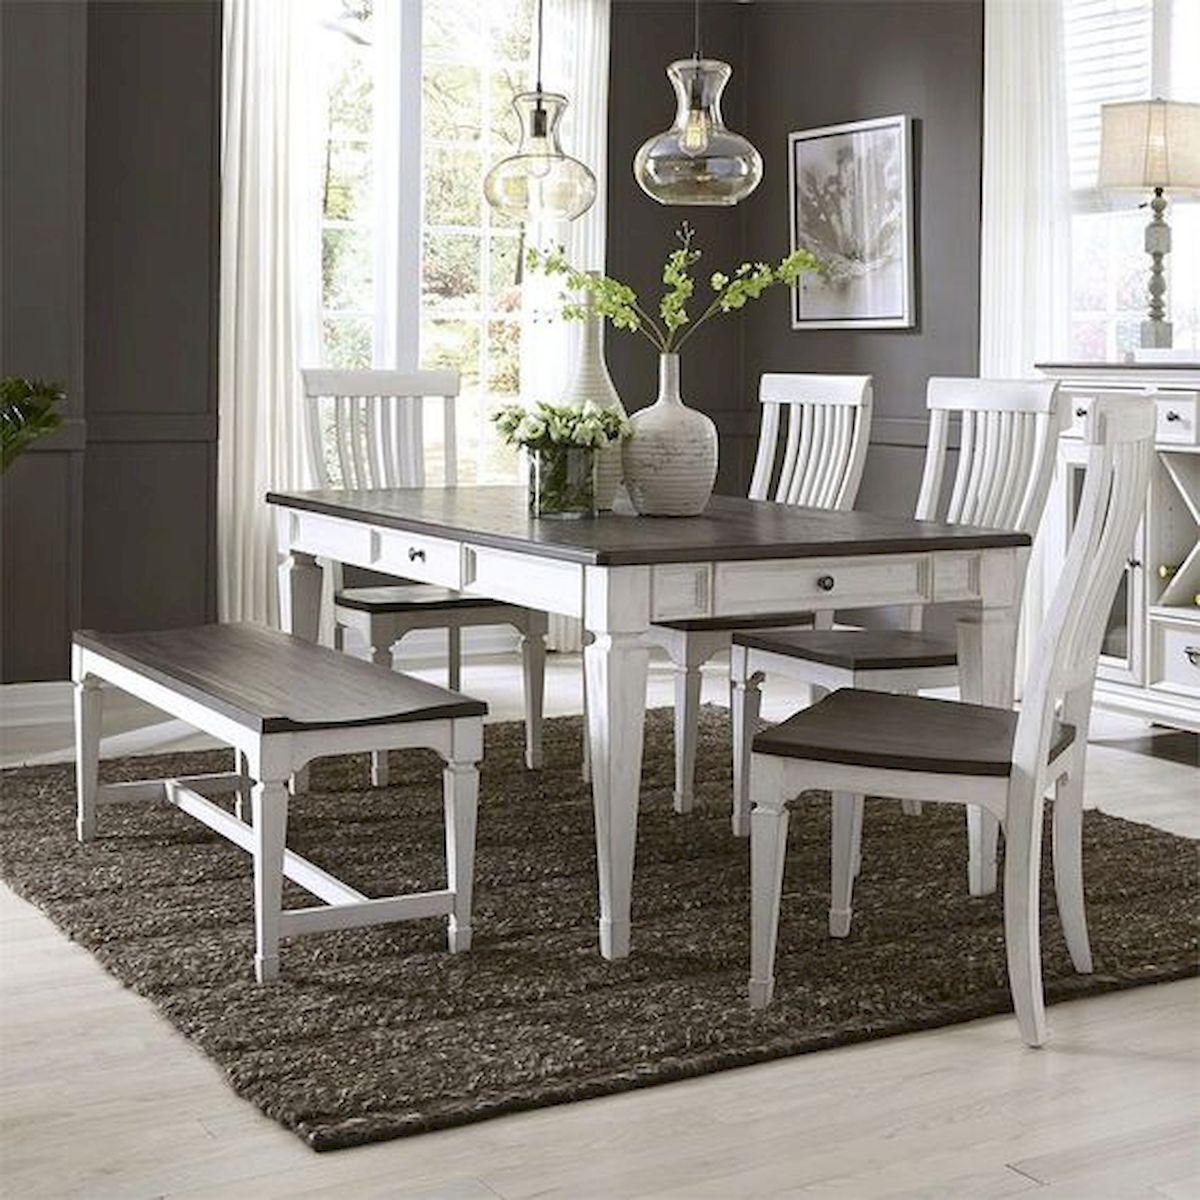 80 Elegant Modern Dining Room Design and Decor Ideas (31)